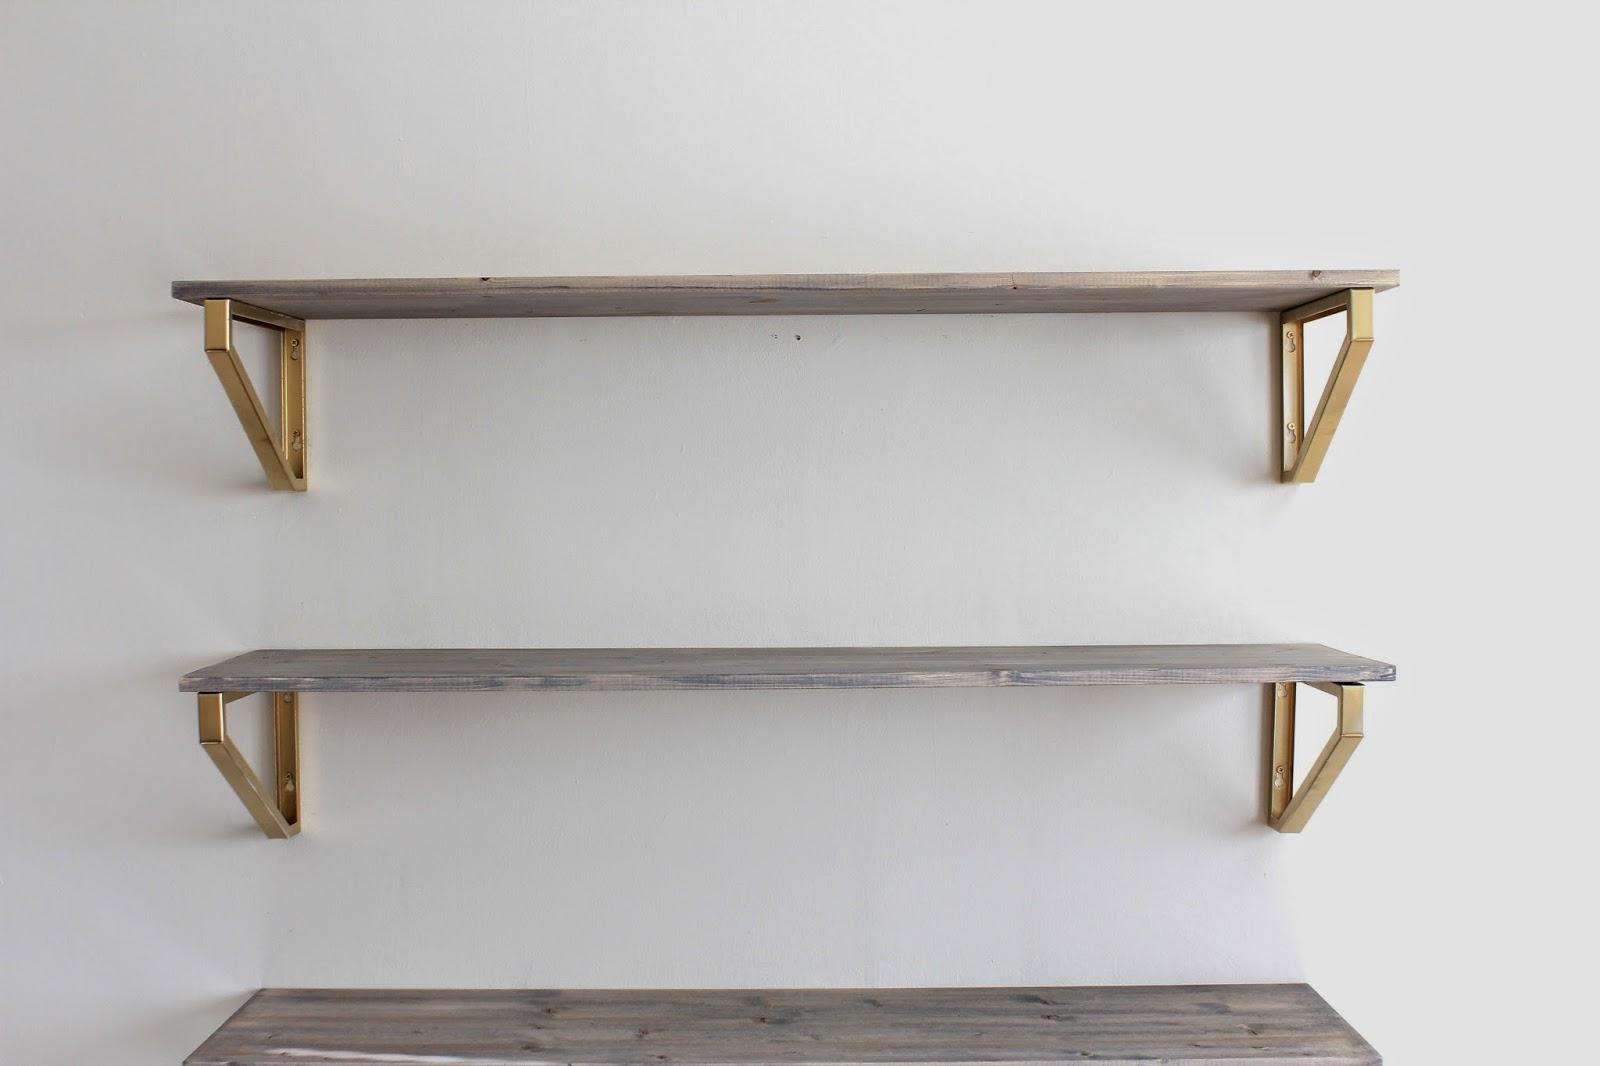 Rustic Wood Shelf DIY